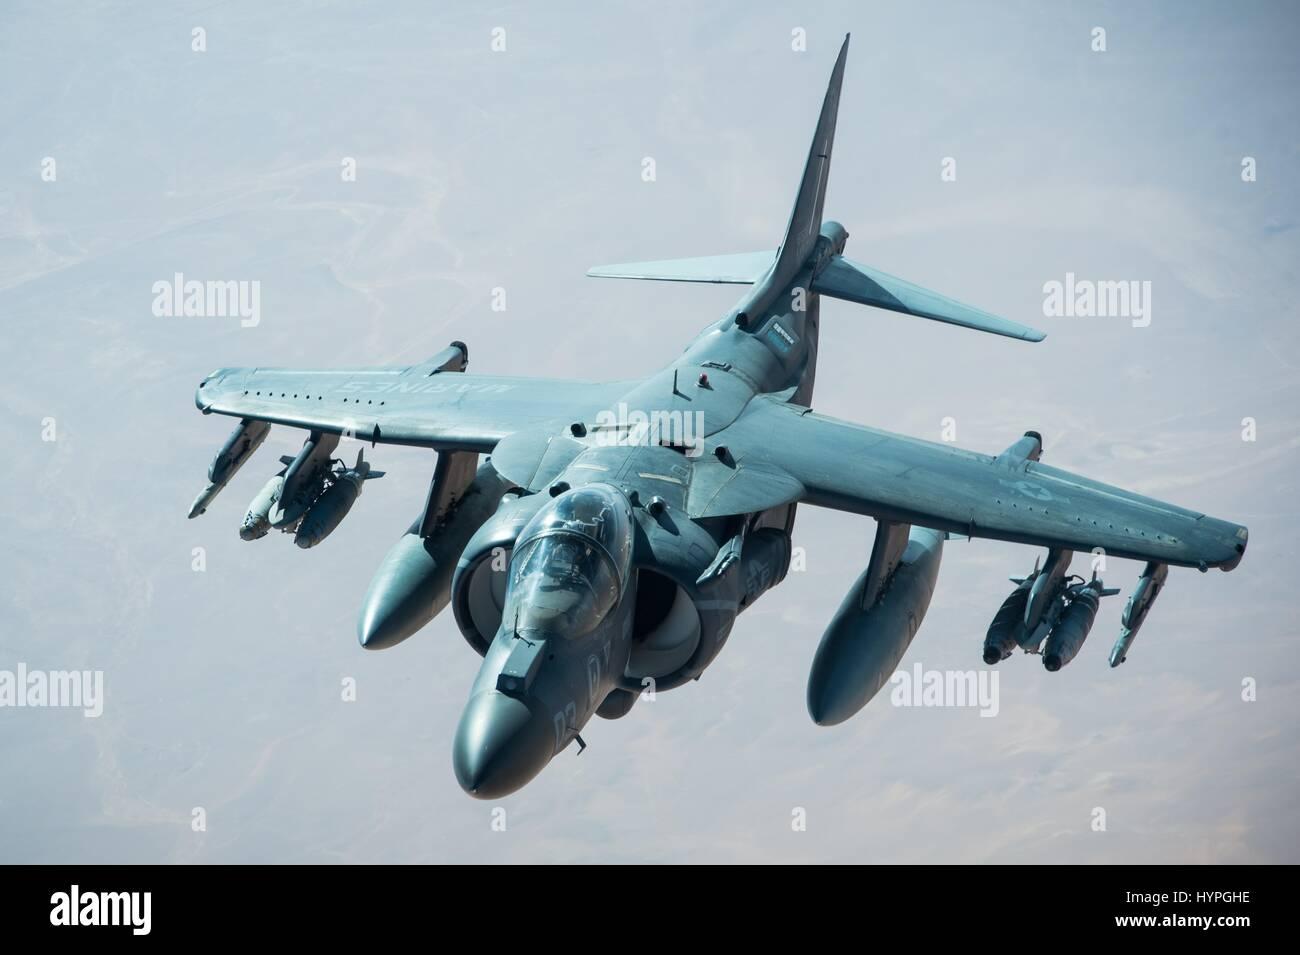 A USMC AV-8B Harrier II attack aircraft in flight during Operation Inherent Resolve February 22, 2017 over Iraq. - Stock Image